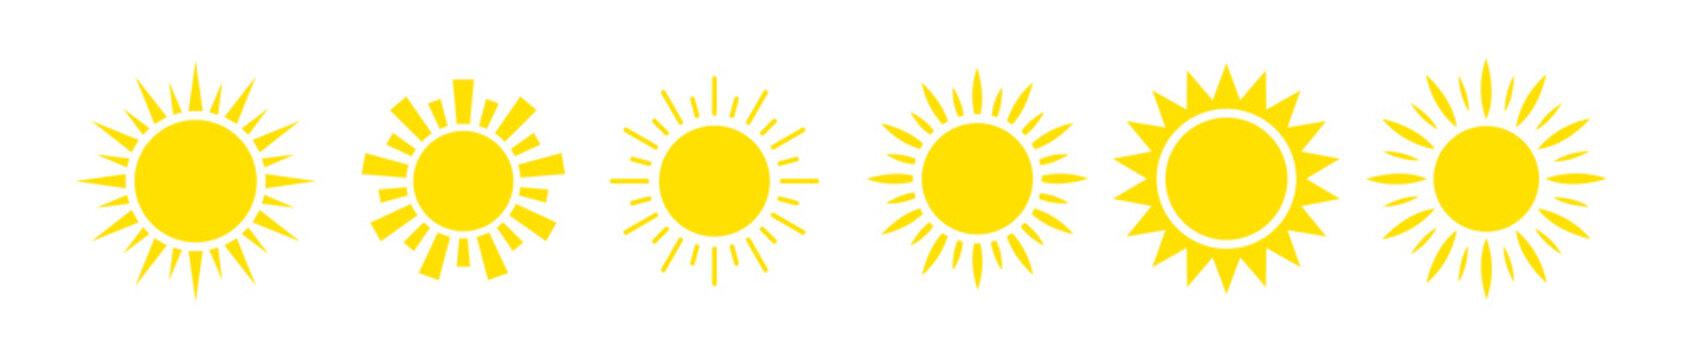 Yellow sun icon set 6 in 1